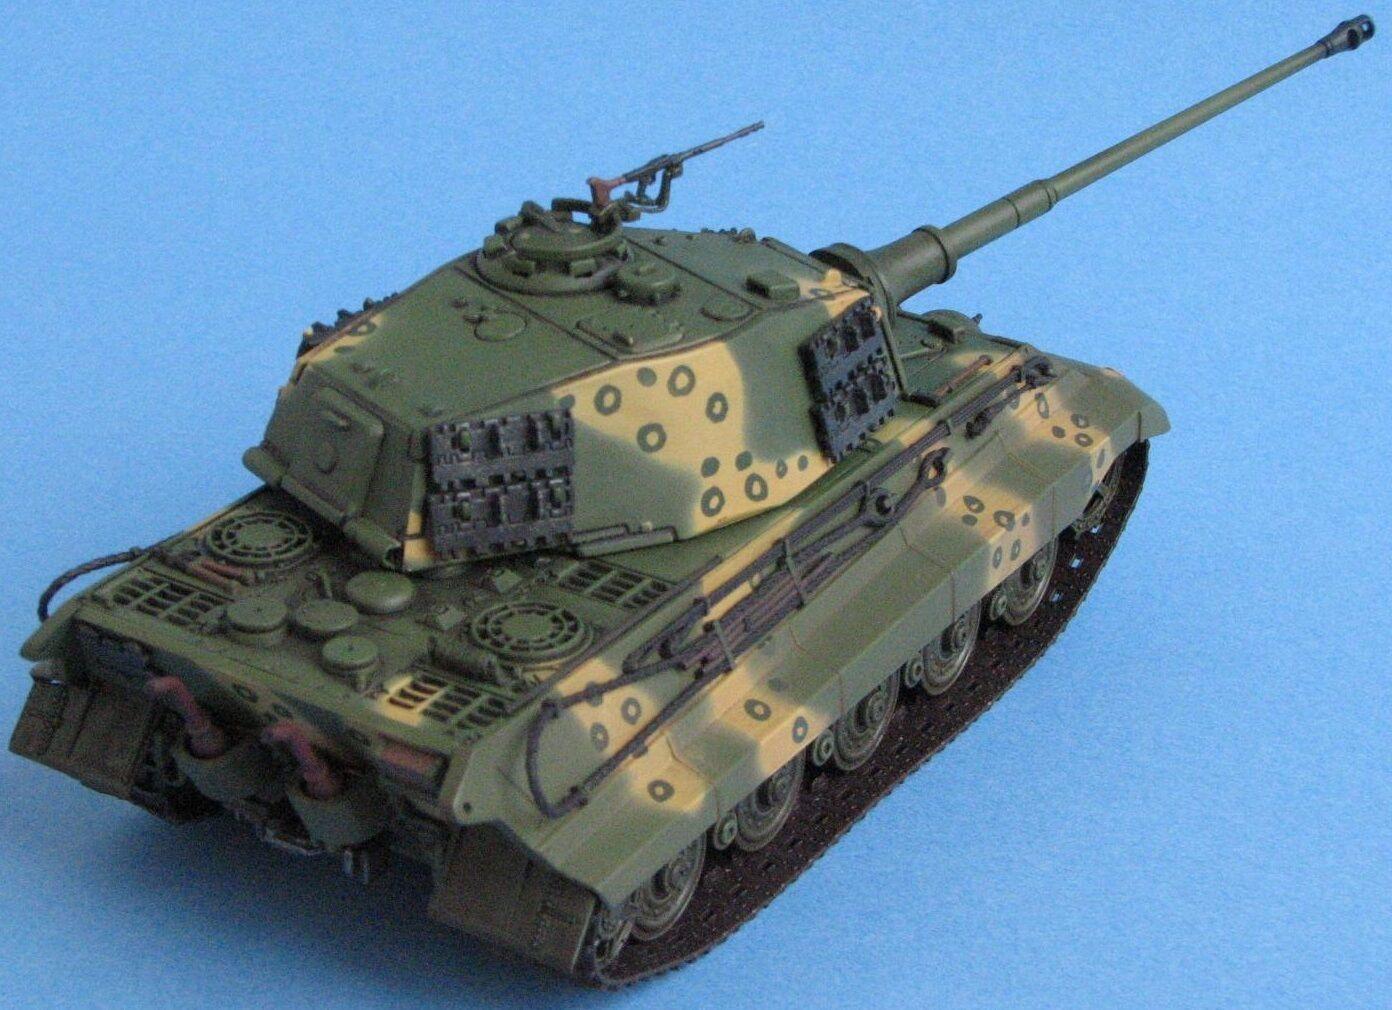 HOBBY MASTER TANK 1 48 King Tiger (Henschel) sPzAbt 511, Germany, April, 1945